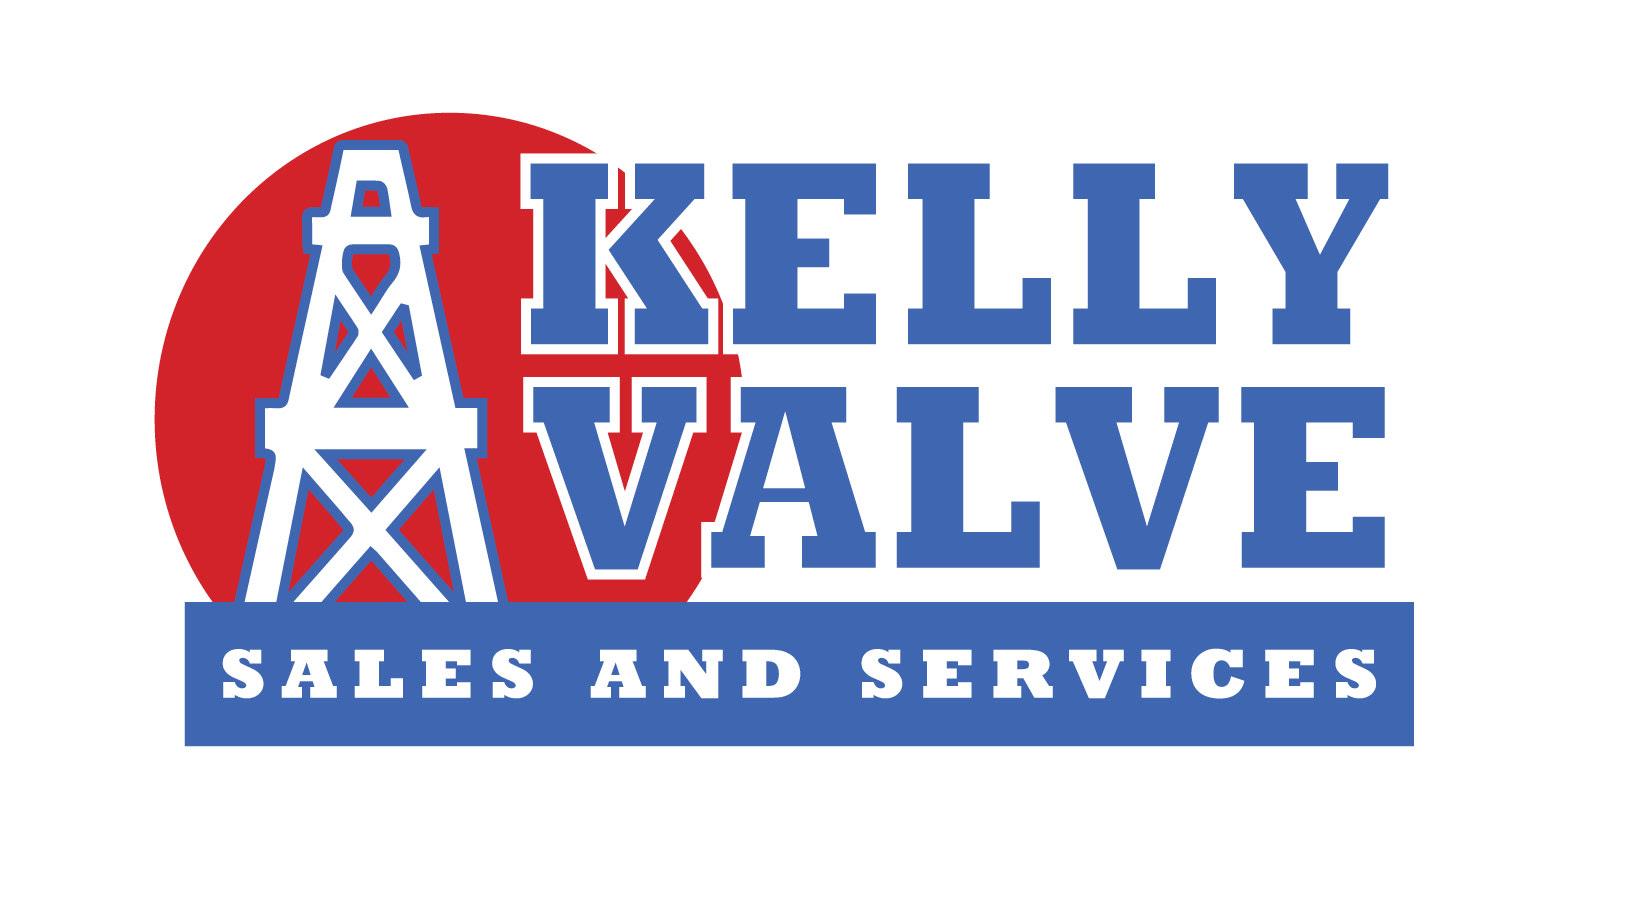 Kelly Valve